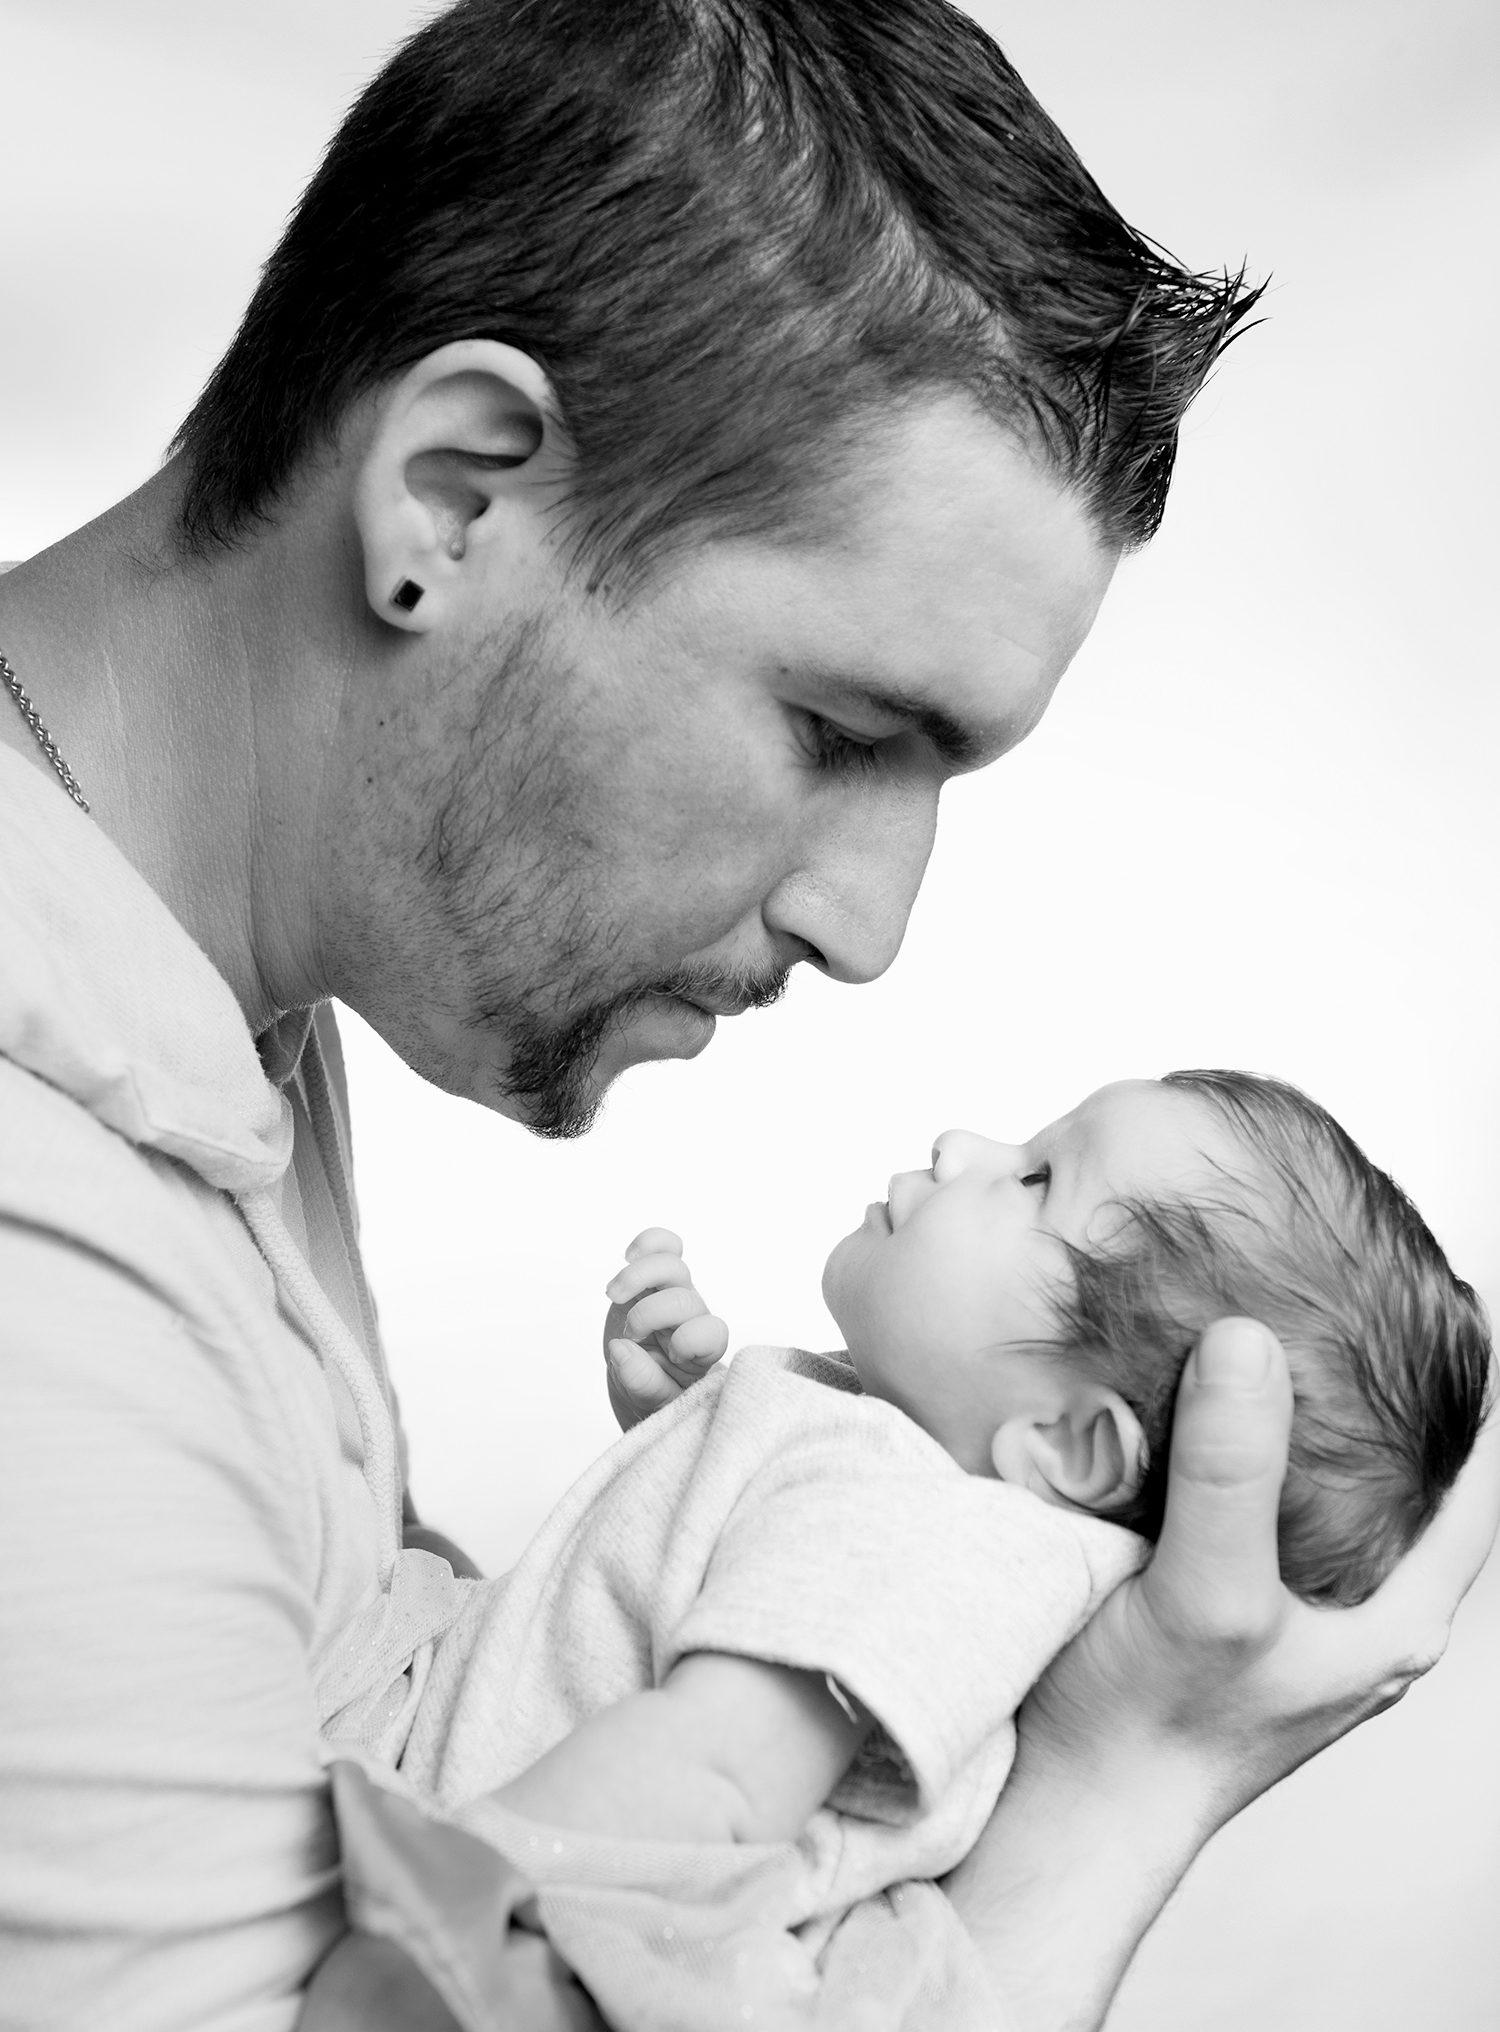 complicite dun pere qui tiens son bebe dans sa main sur fond de studio blanc